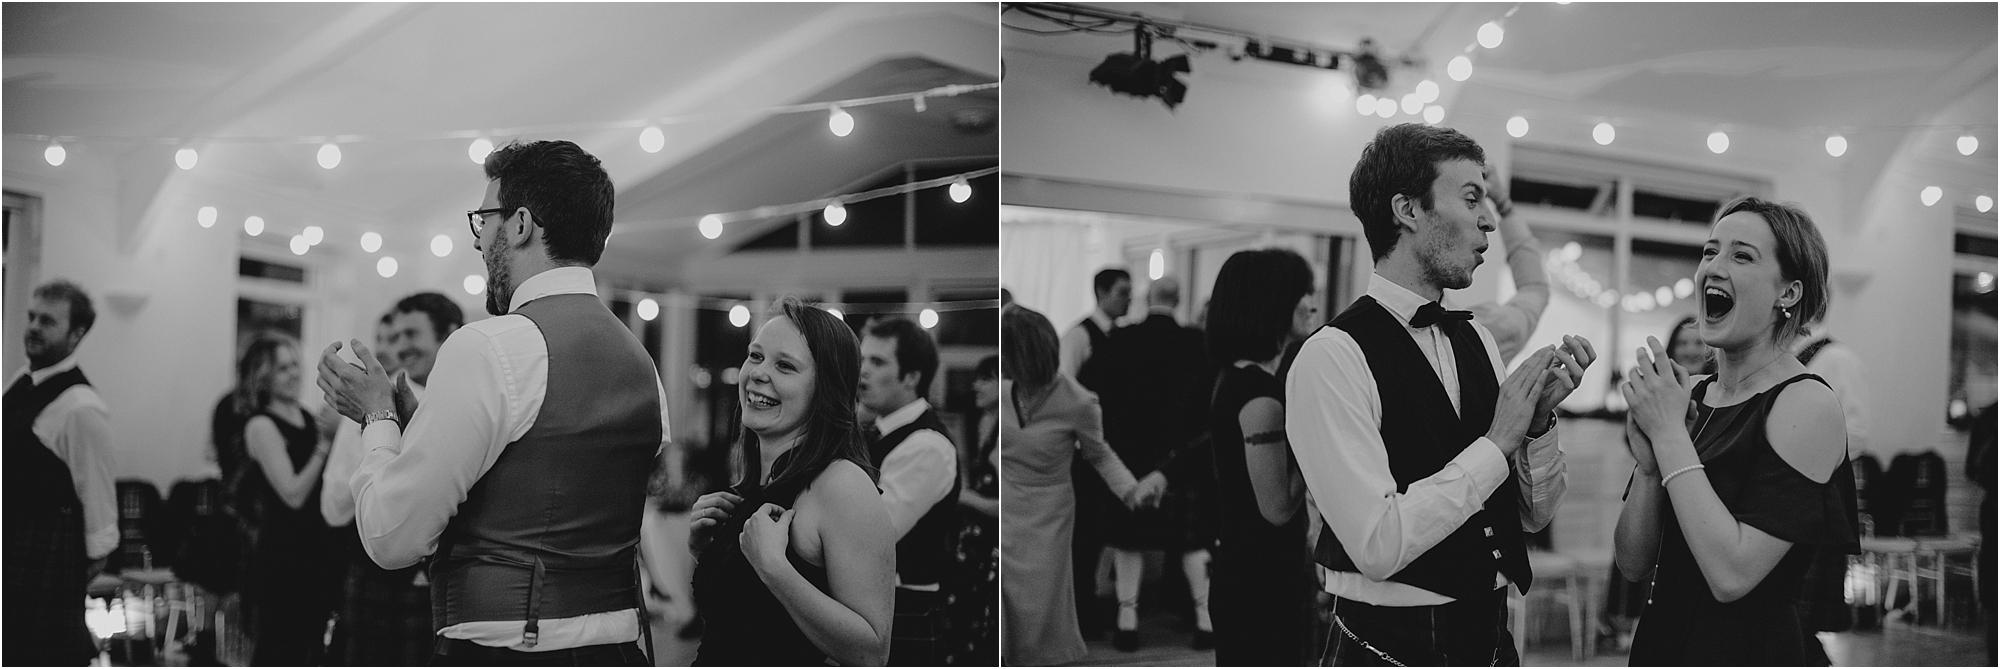 Kinlochard-village-hall-scottish-wedding-claire-fleck-photography__0119.jpg